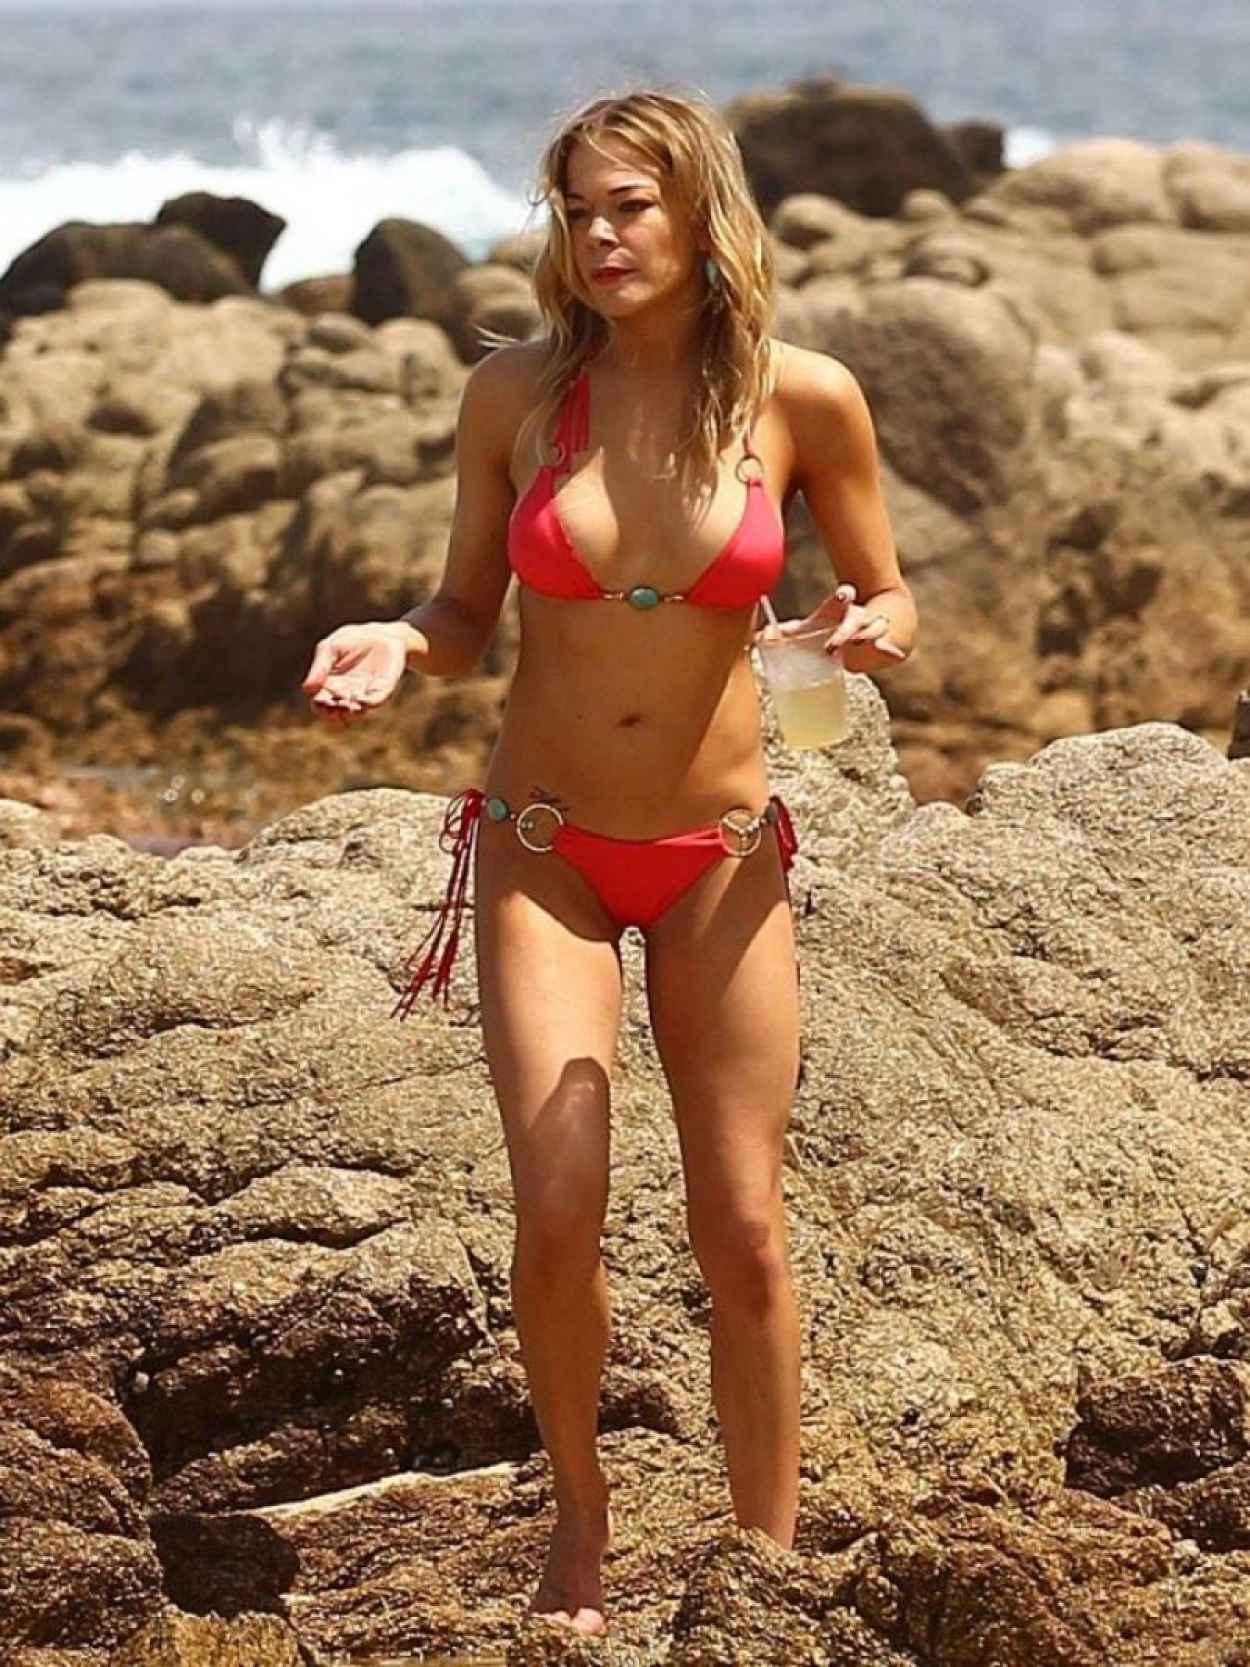 Bikini picture of leann rimes not